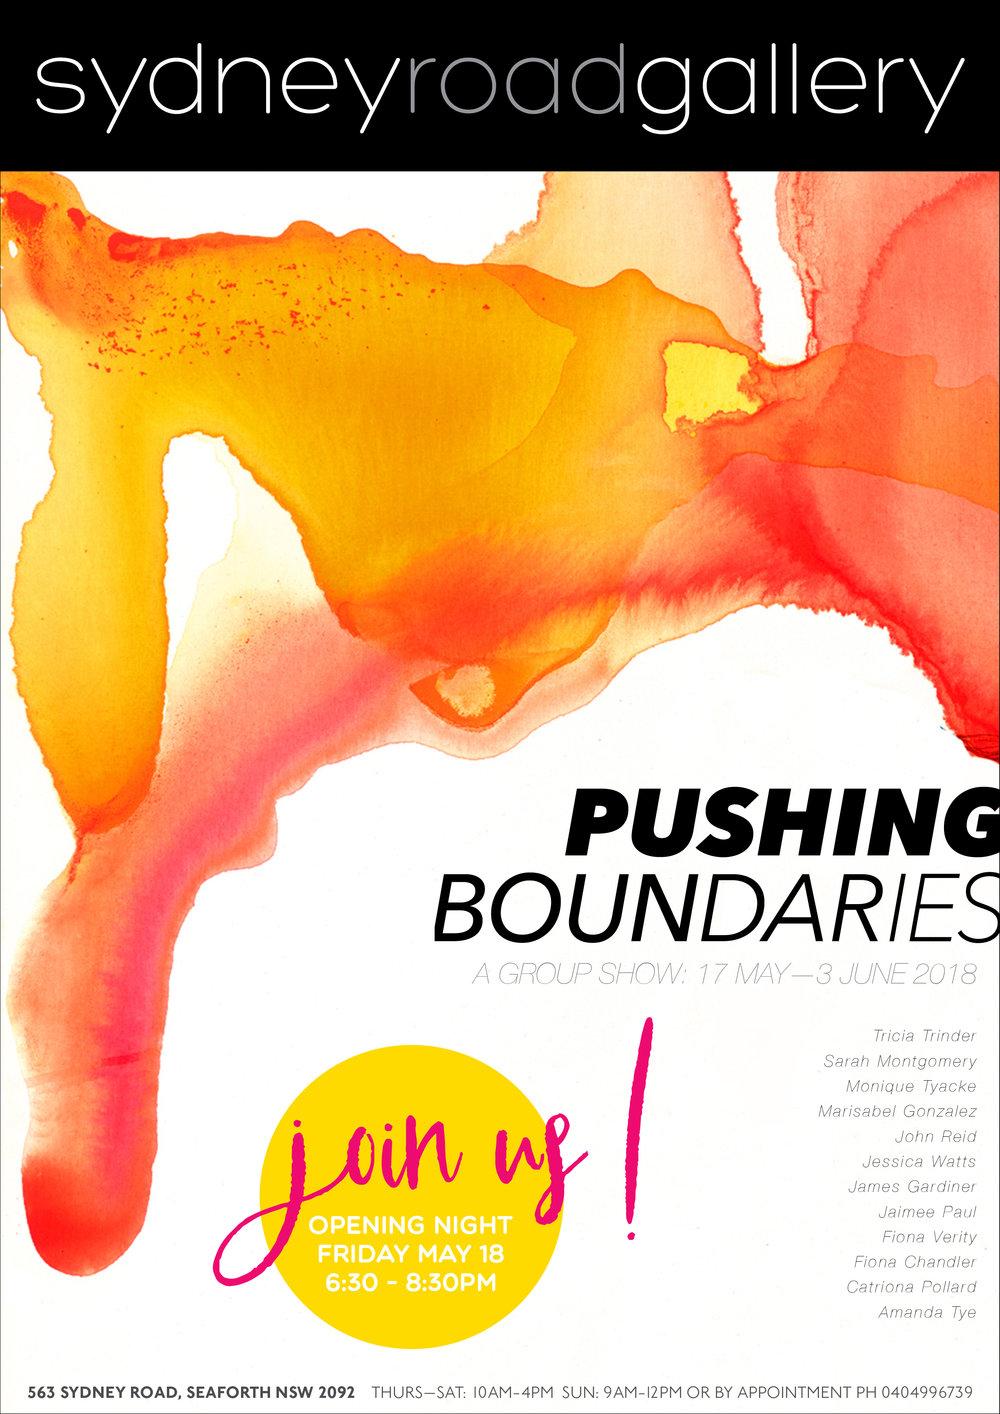 PUSHING BOUNDARIES - 17TH MAY - 3RD JUNE 2018